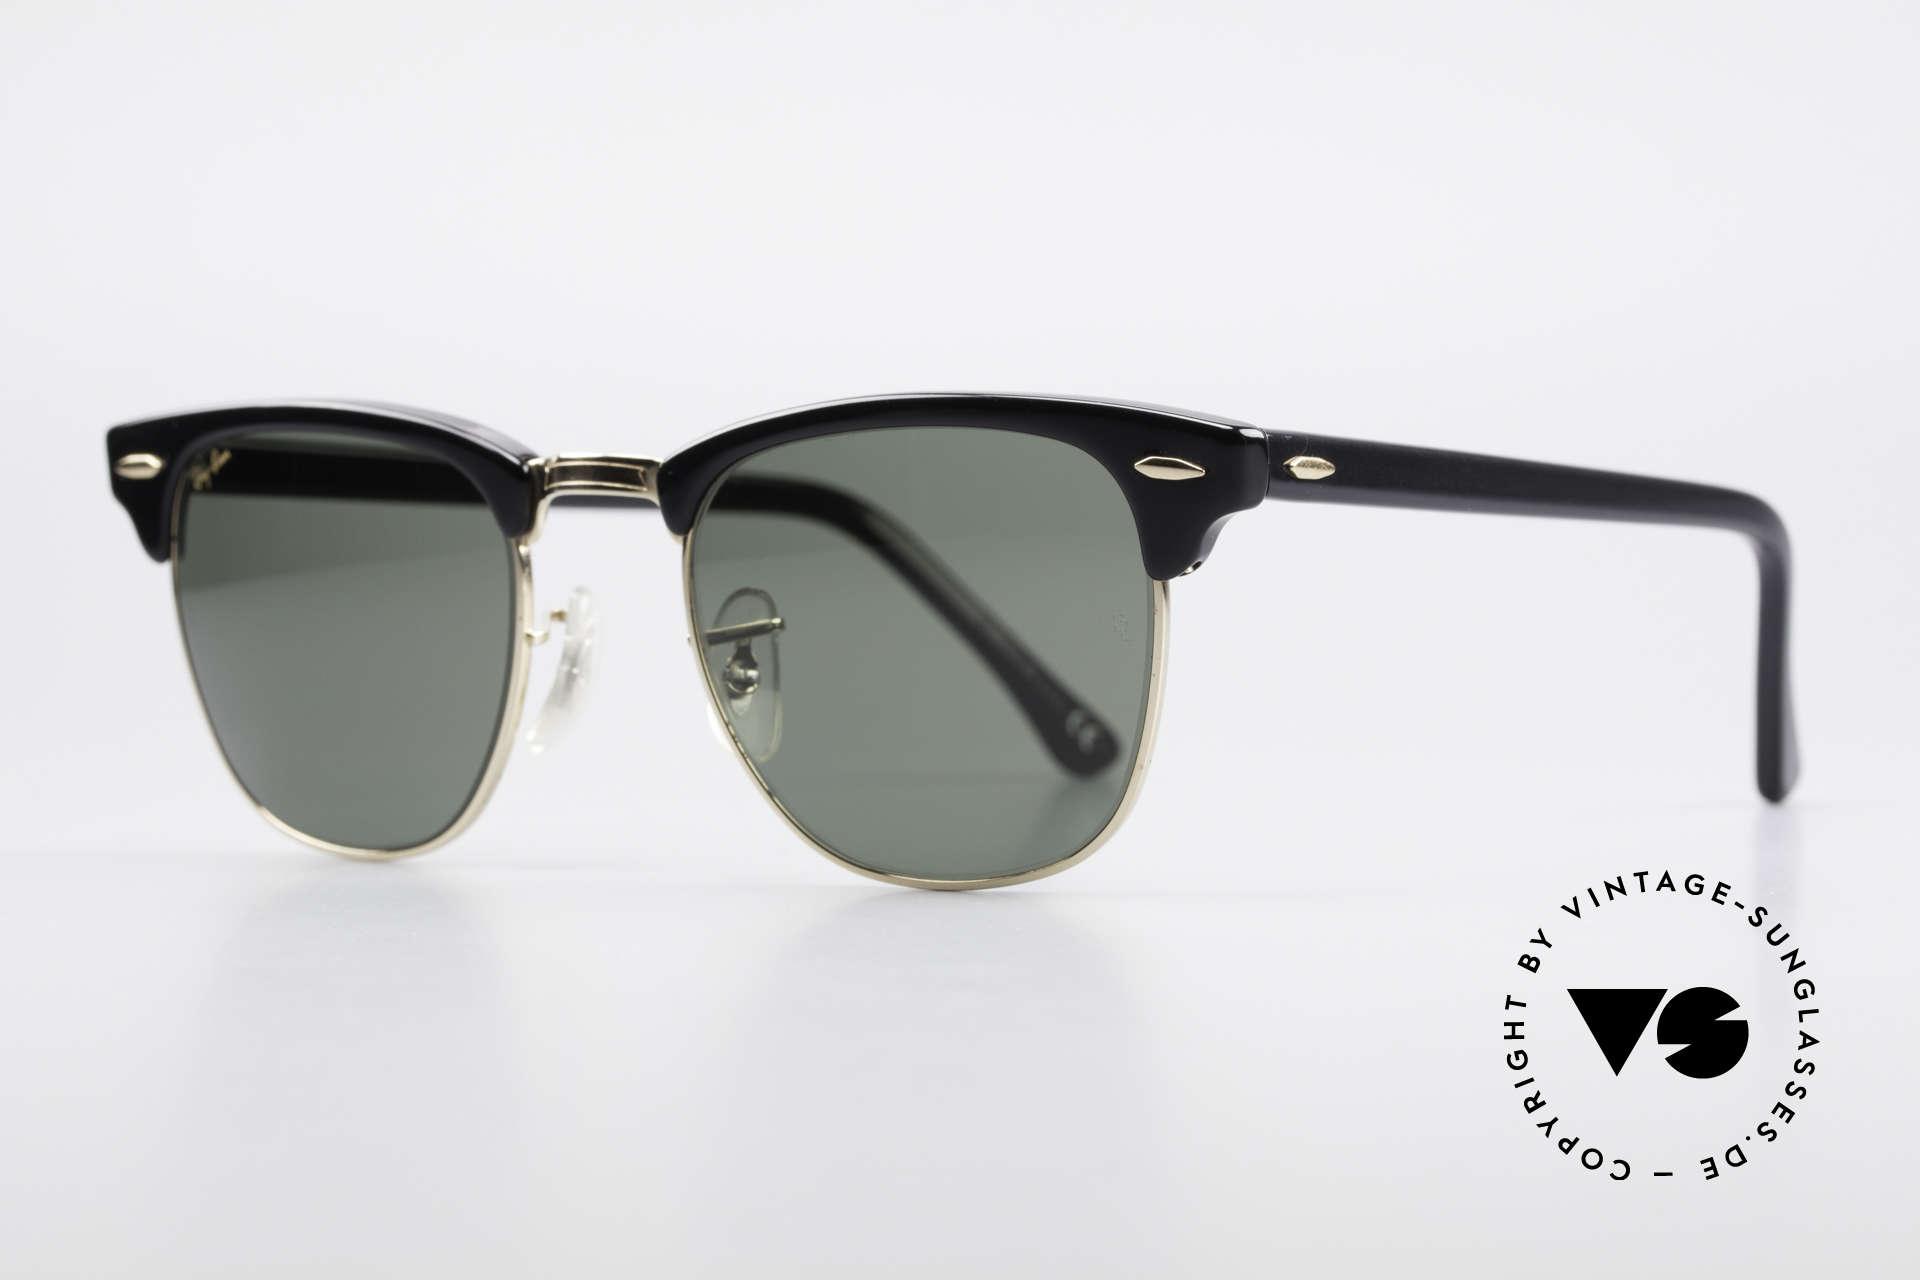 Sonnenbrillen Ray Ban Clubmaster Bausch & Lomb USA W0365